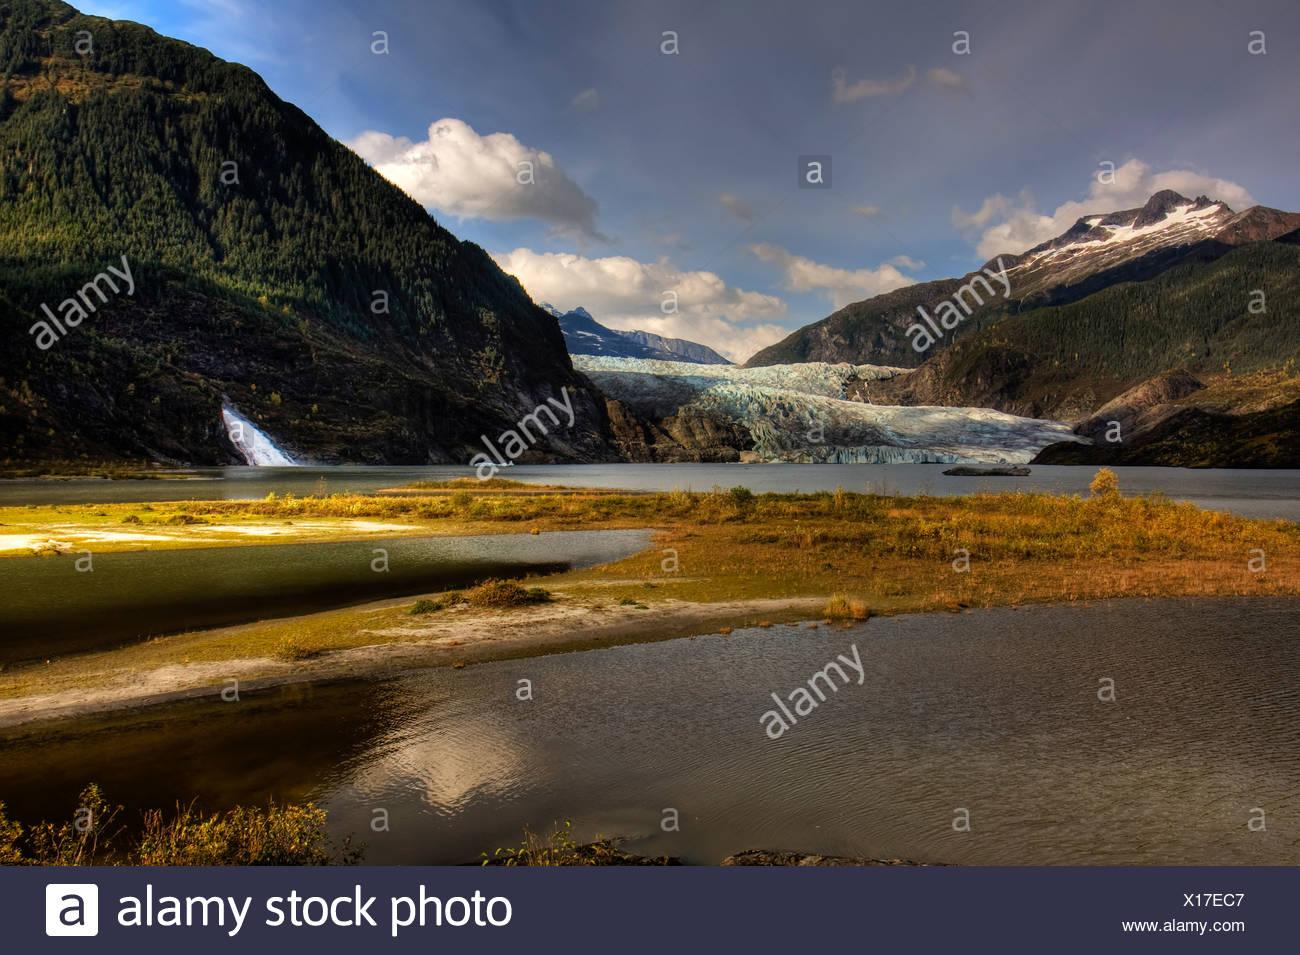 Scenic view of Mendenhall Glacier near Juneau, Alaska in Autumn - Stock Image